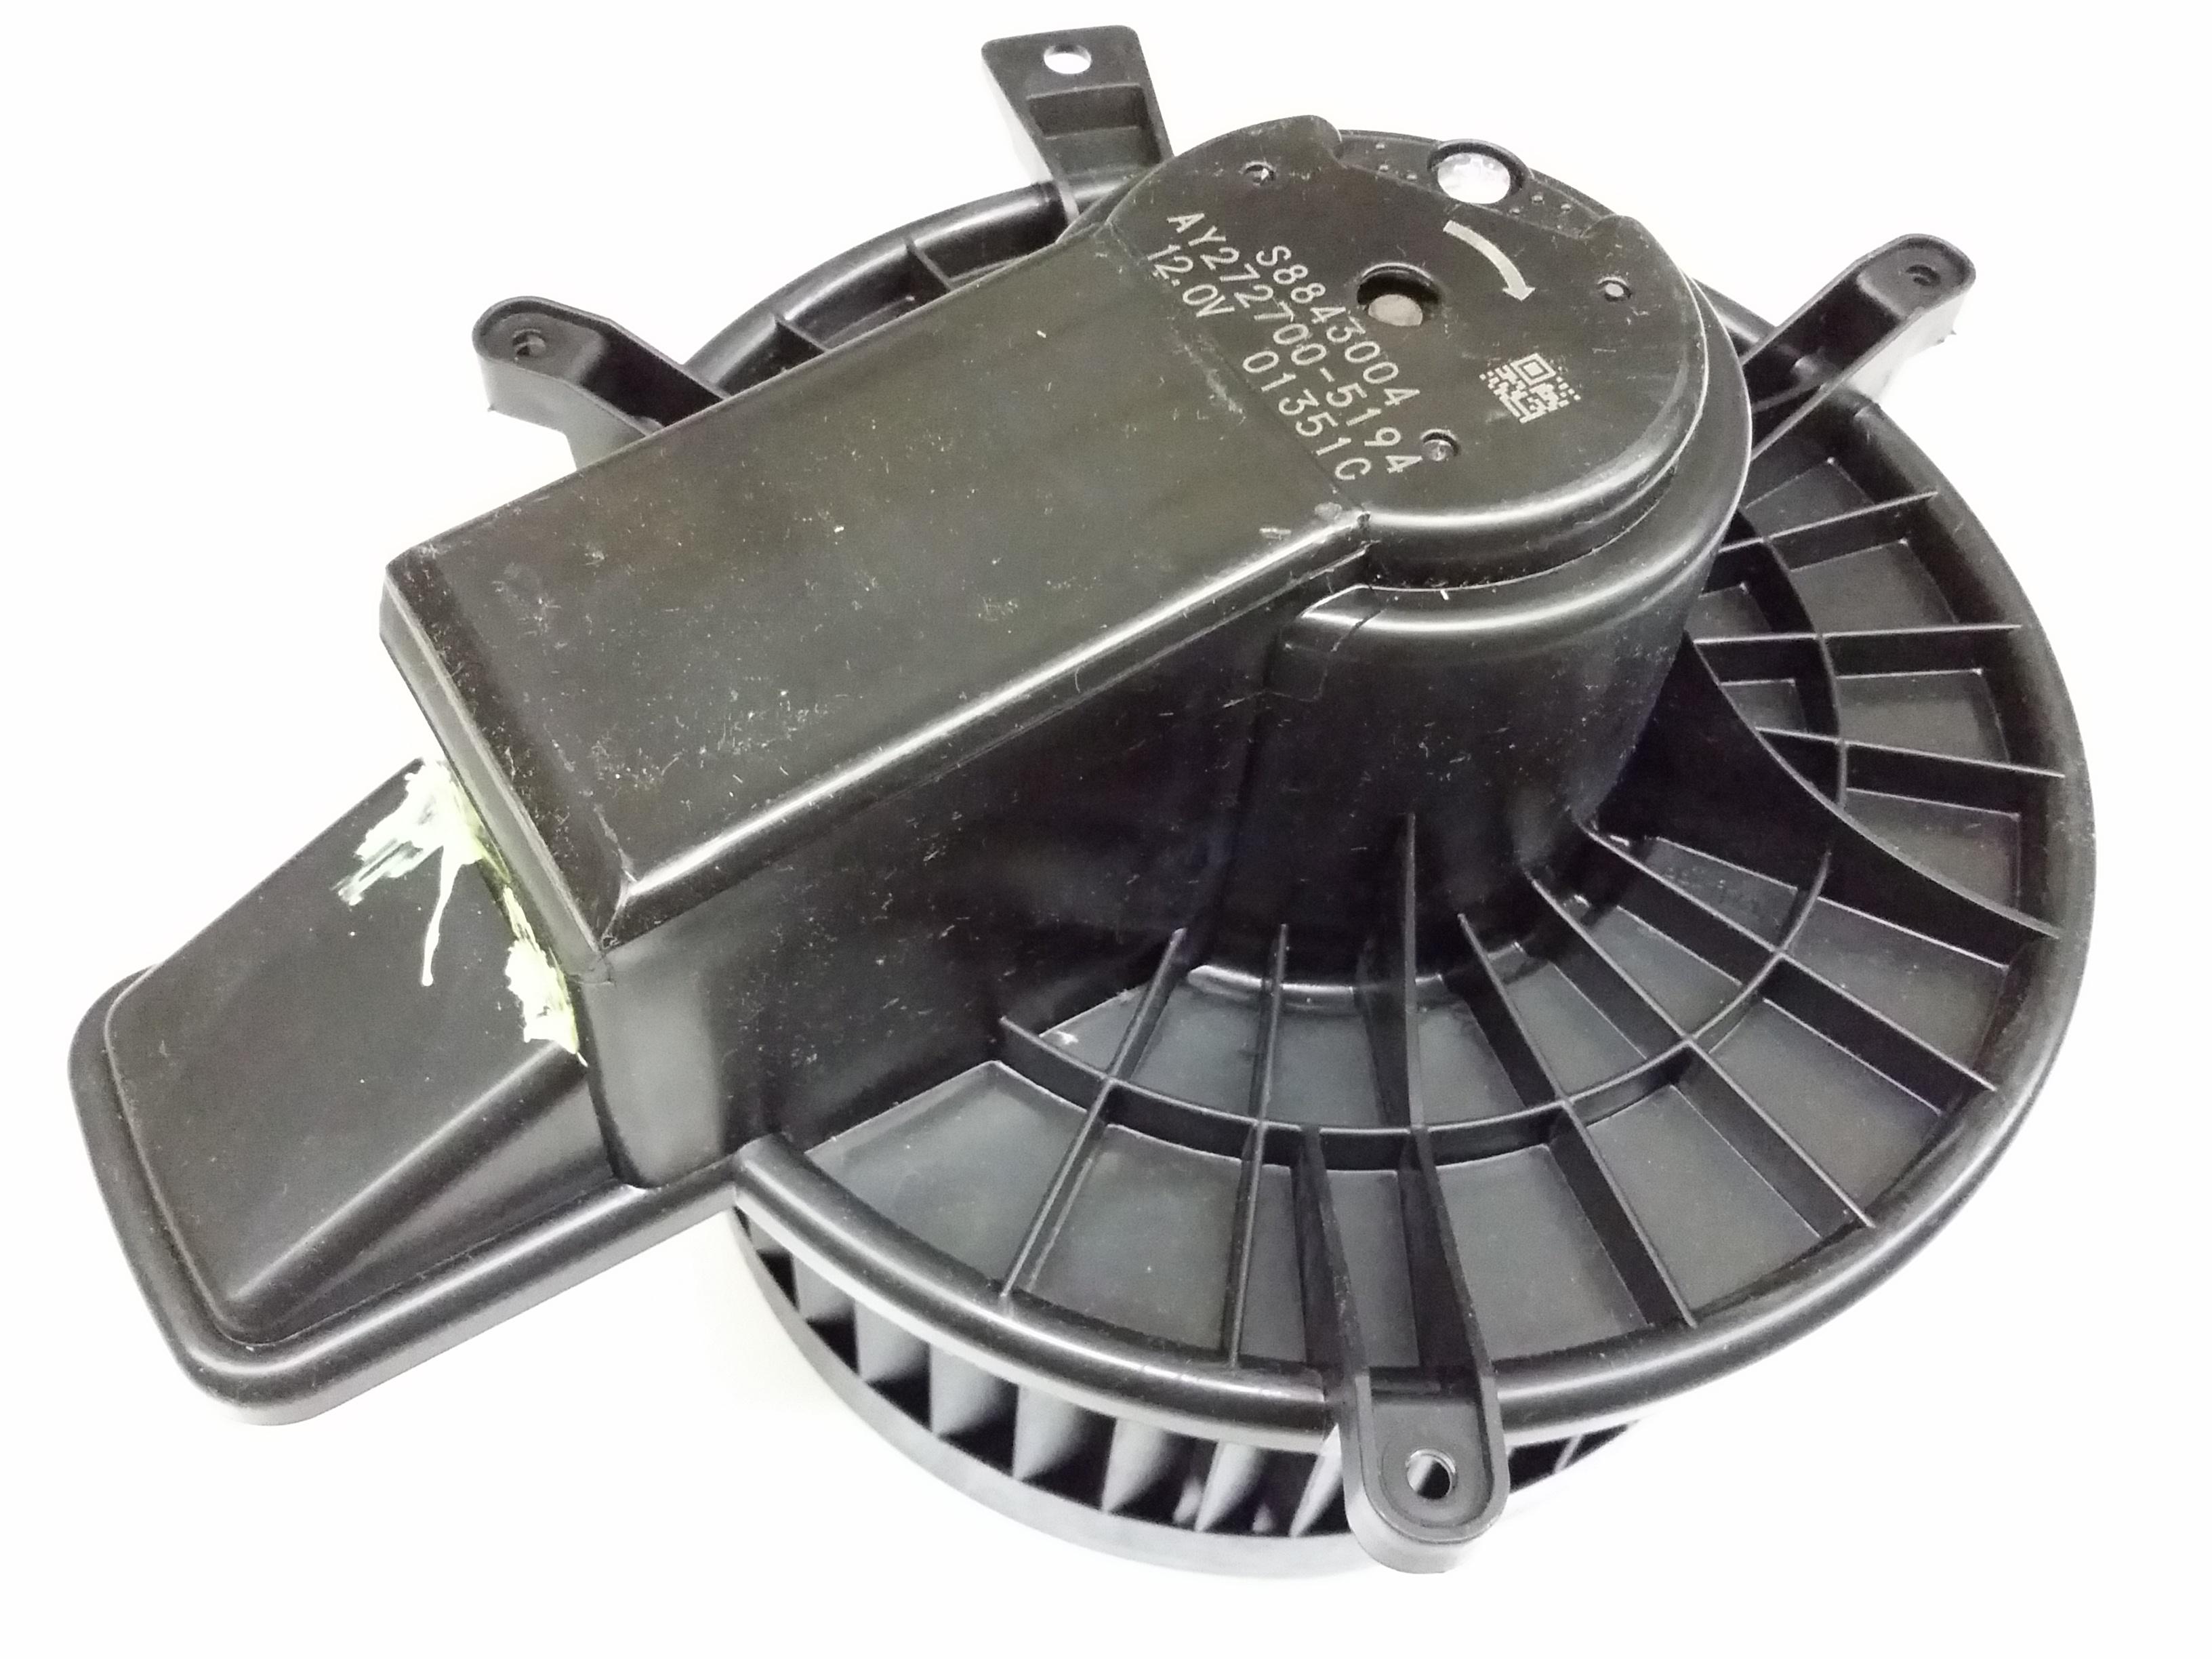 2012 Volkswagen Routan. #7B0820021: Blower motor. HVAC Blower Motor. #5E5951